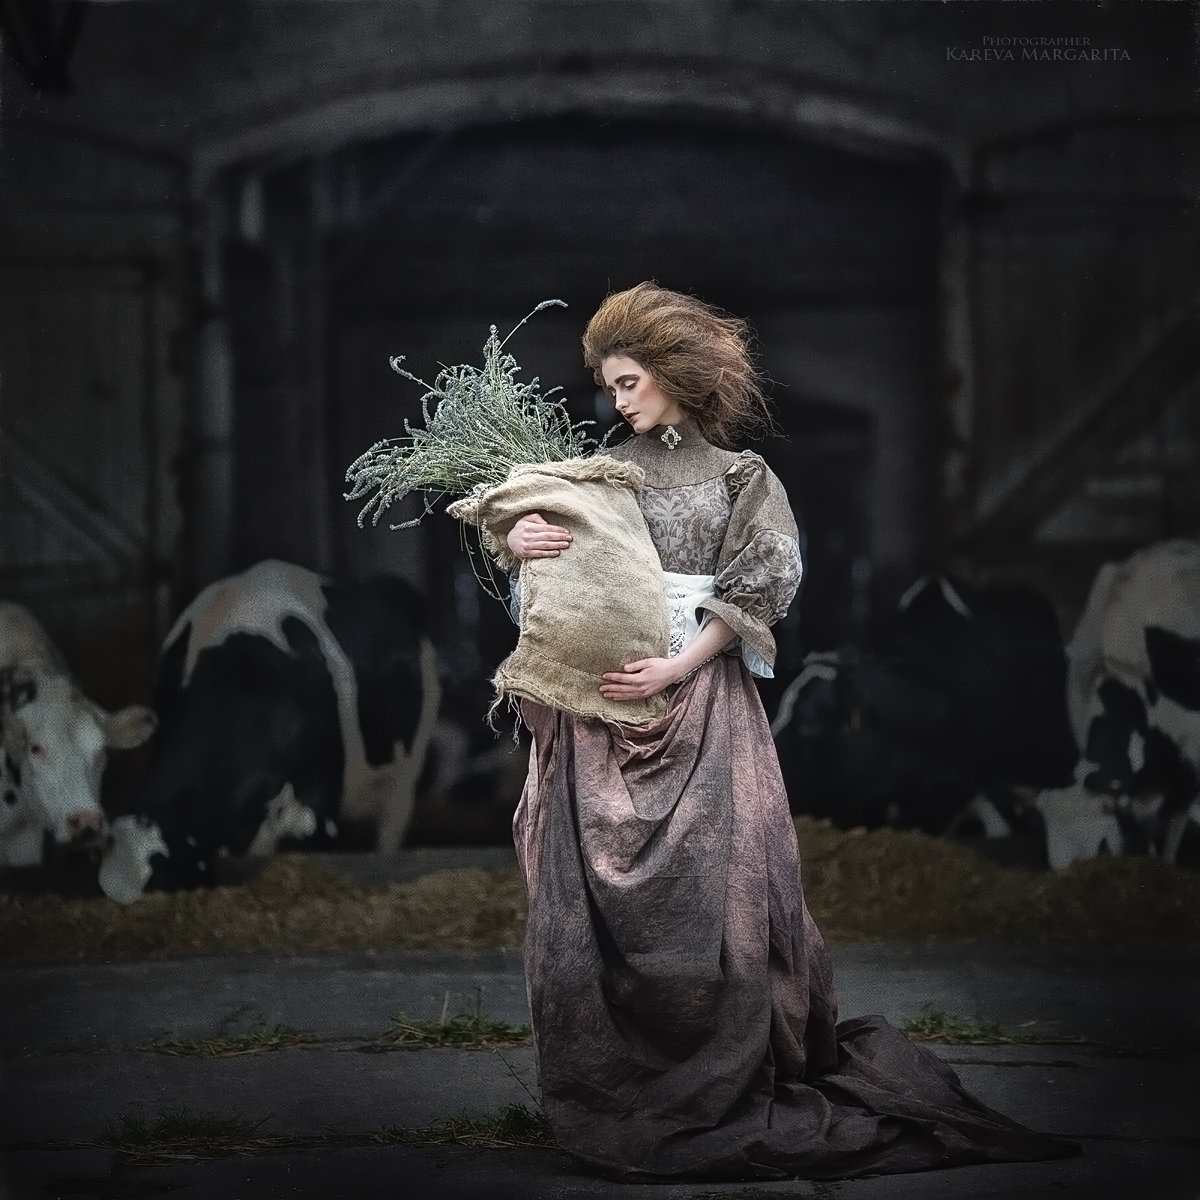 Сухая трава / фотограф Маргарита Карева